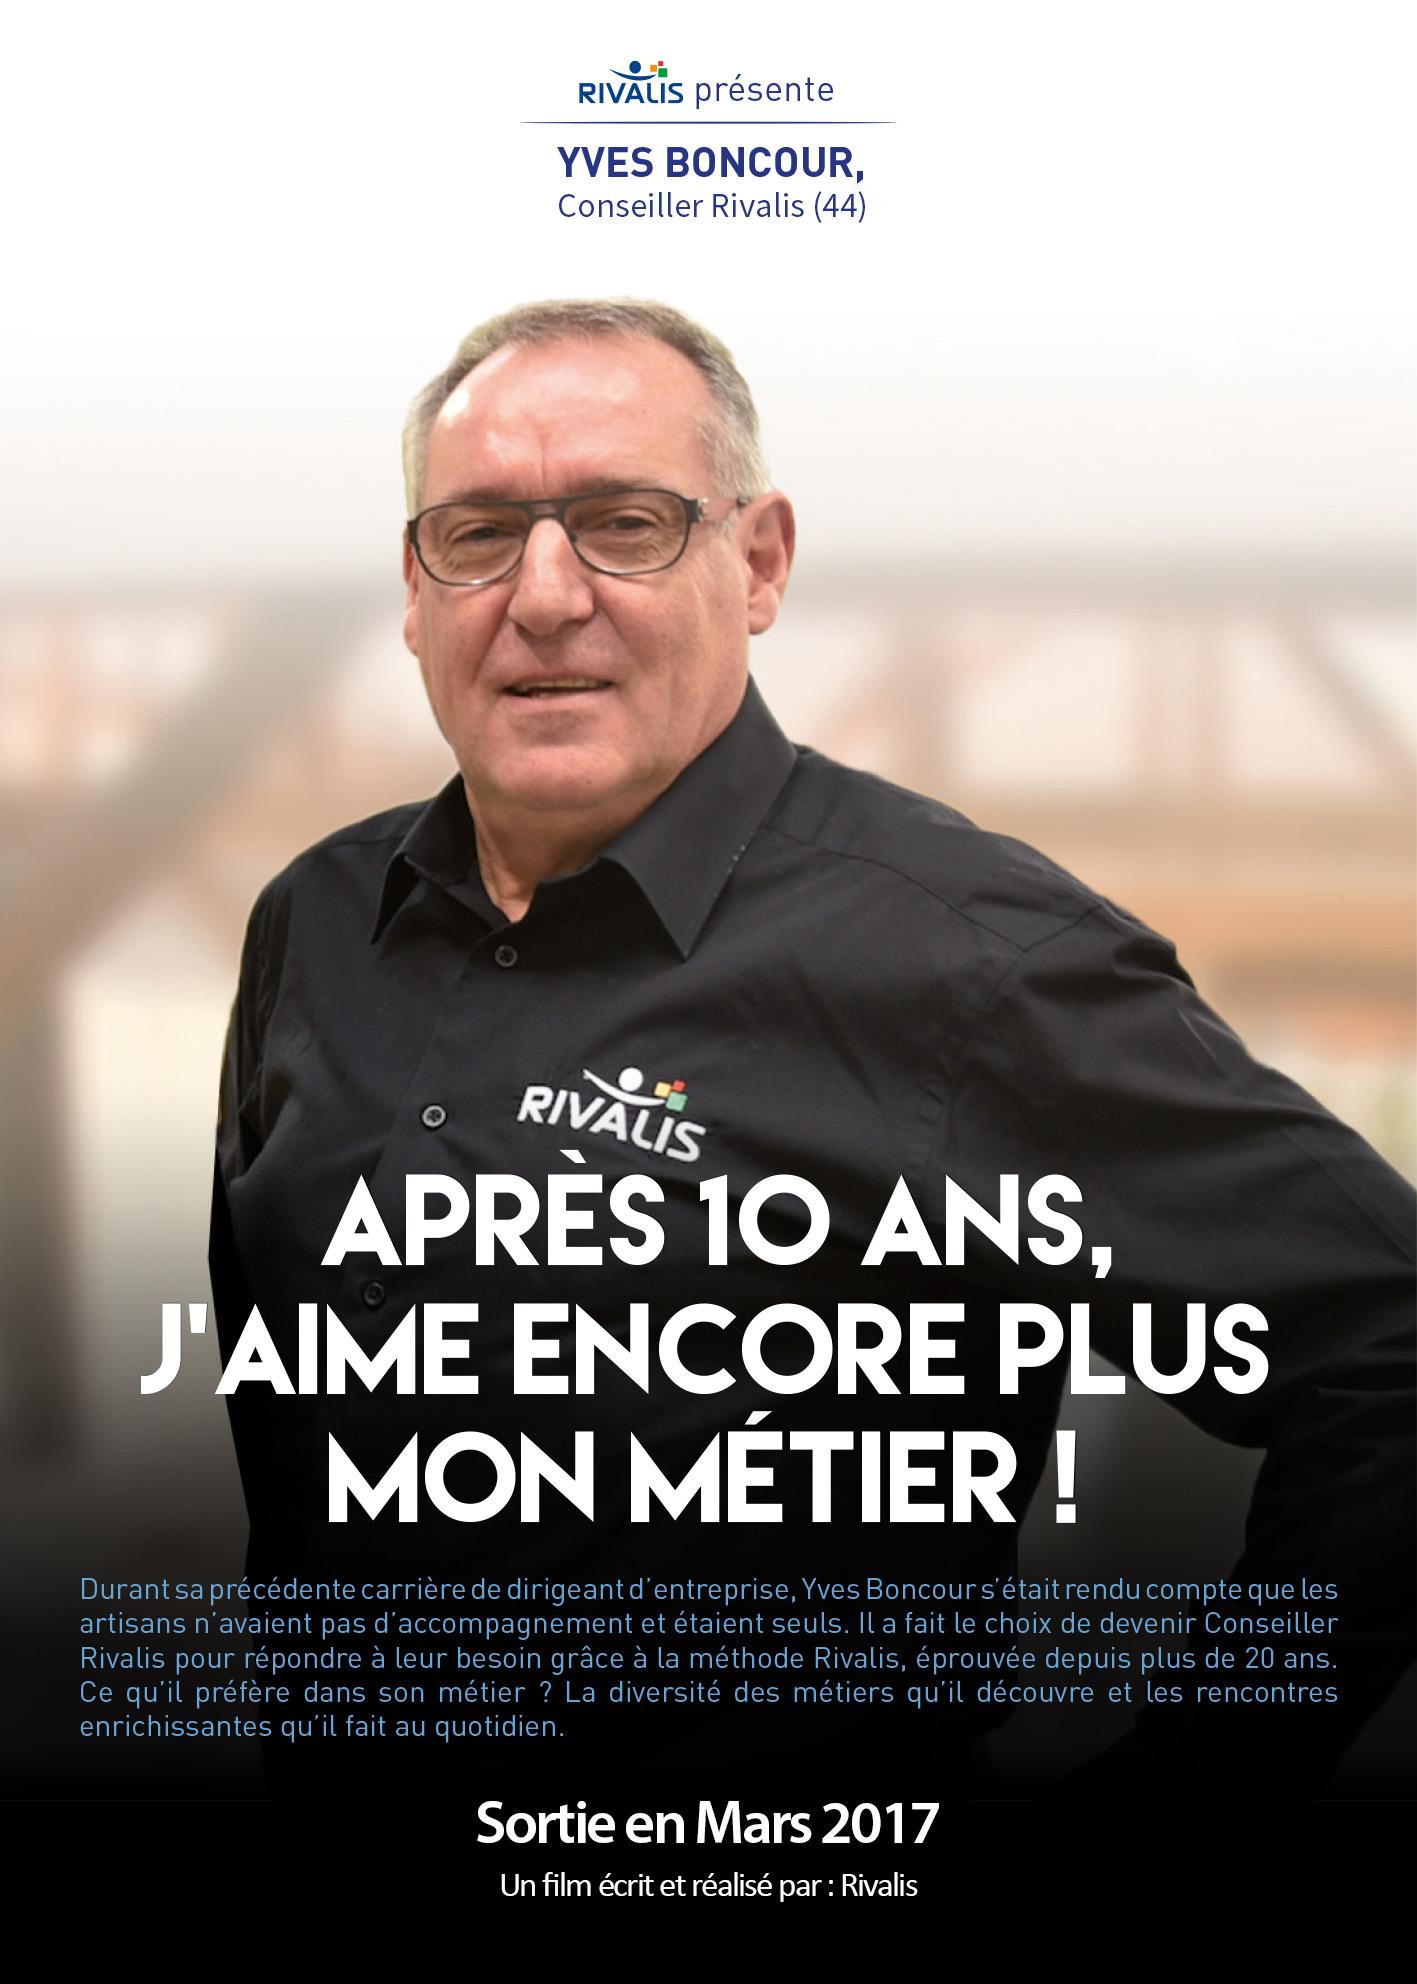 Yves Boncour (44)